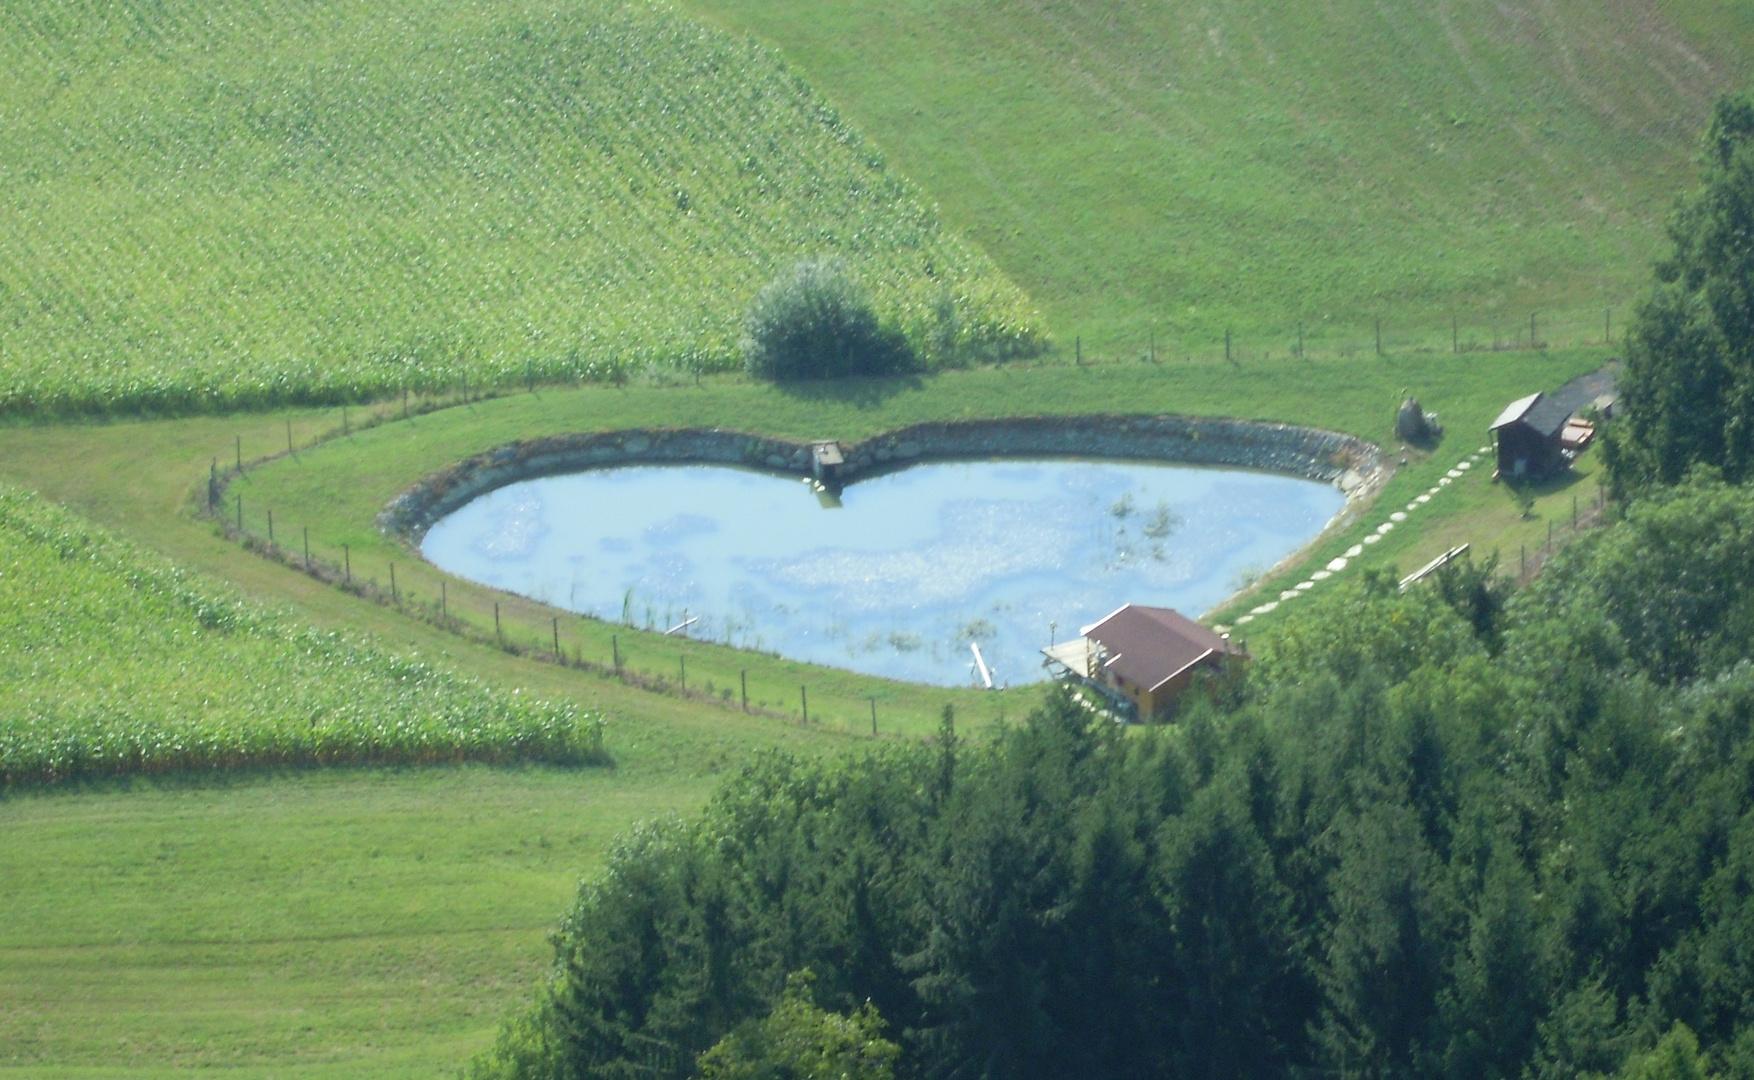 herzförmiger See